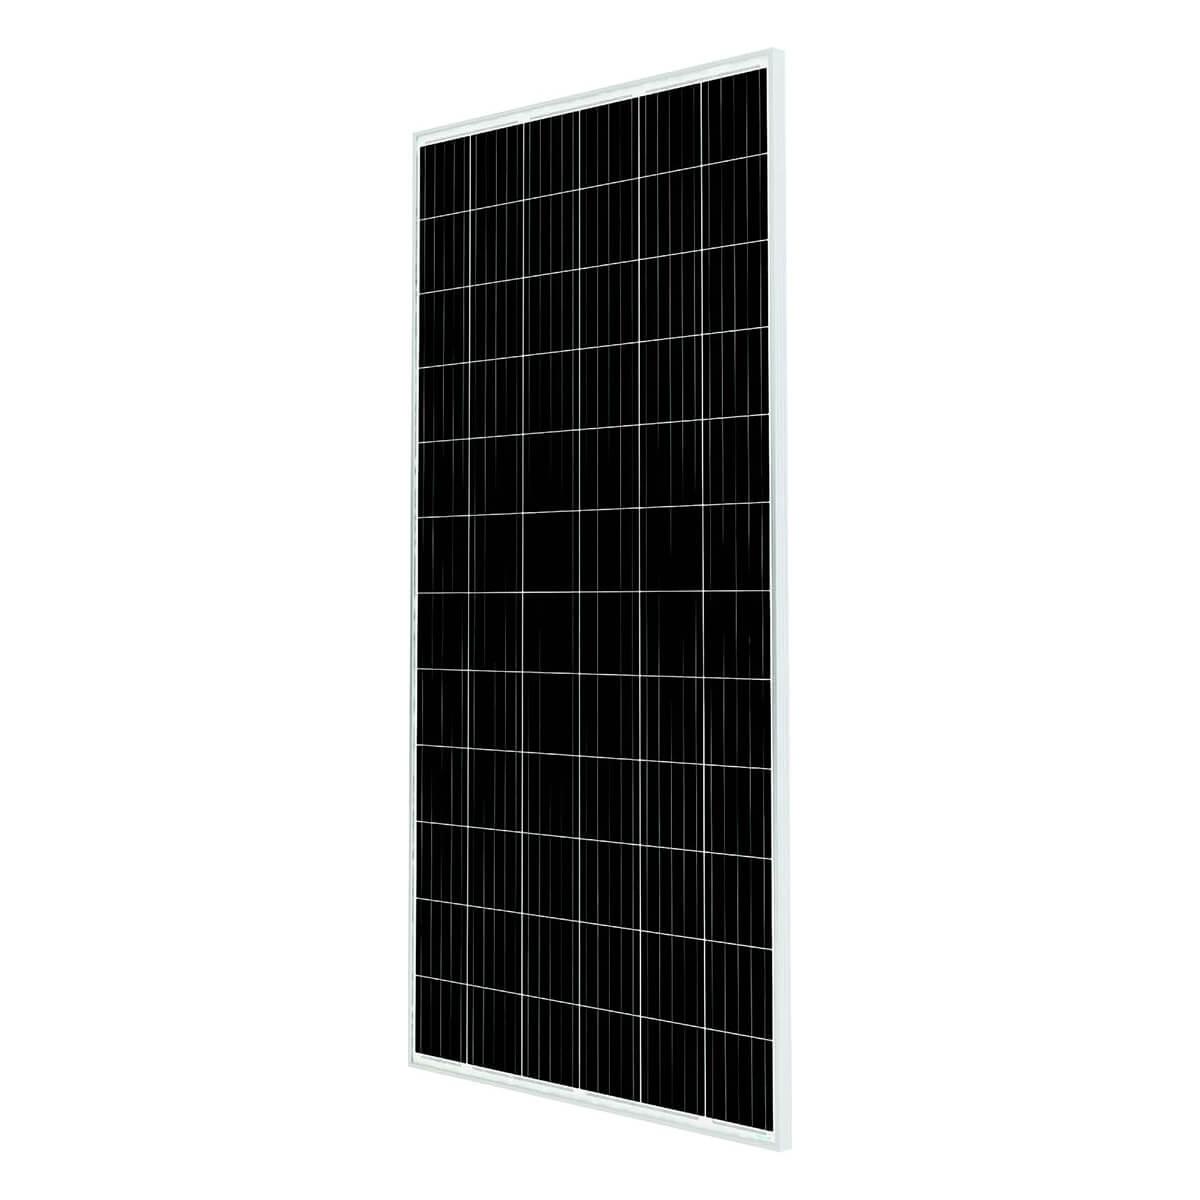 cw enerji 375W panel, cw enerji 375Watt panel, cw enerji 375 W panel, cw enerji 375 Watt panel, cw enerji 375 Watt monokristal panel, cw enerji 375 W watt gunes paneli, cw enerji 375 W watt monokristal gunes paneli, cw enerji 375 W Watt fotovoltaik monokristal solar panel, cw enerji 375W monokristal gunes enerjisi, cw enerji CWT375-72PM-375 panel, CW Enerji 375 WATT